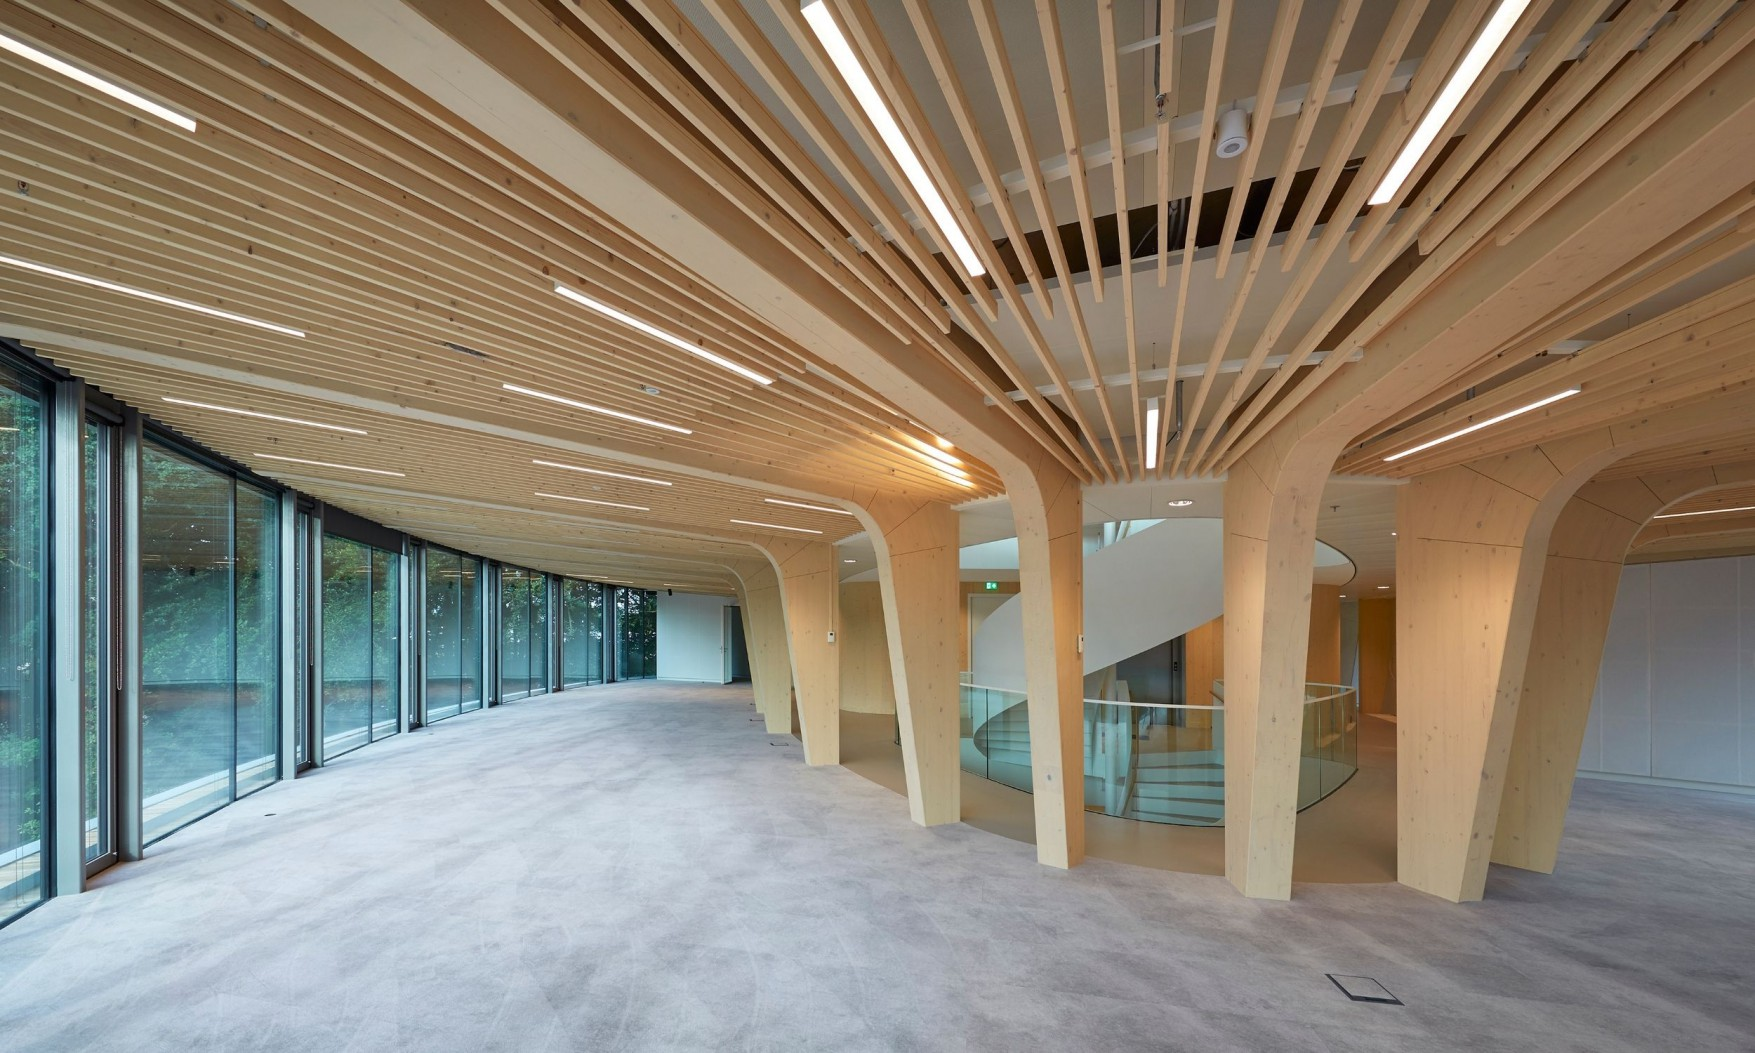 Harryvan Interieurbouw | latten plafond en wandbekleding (Triodos Bank Driebergen)